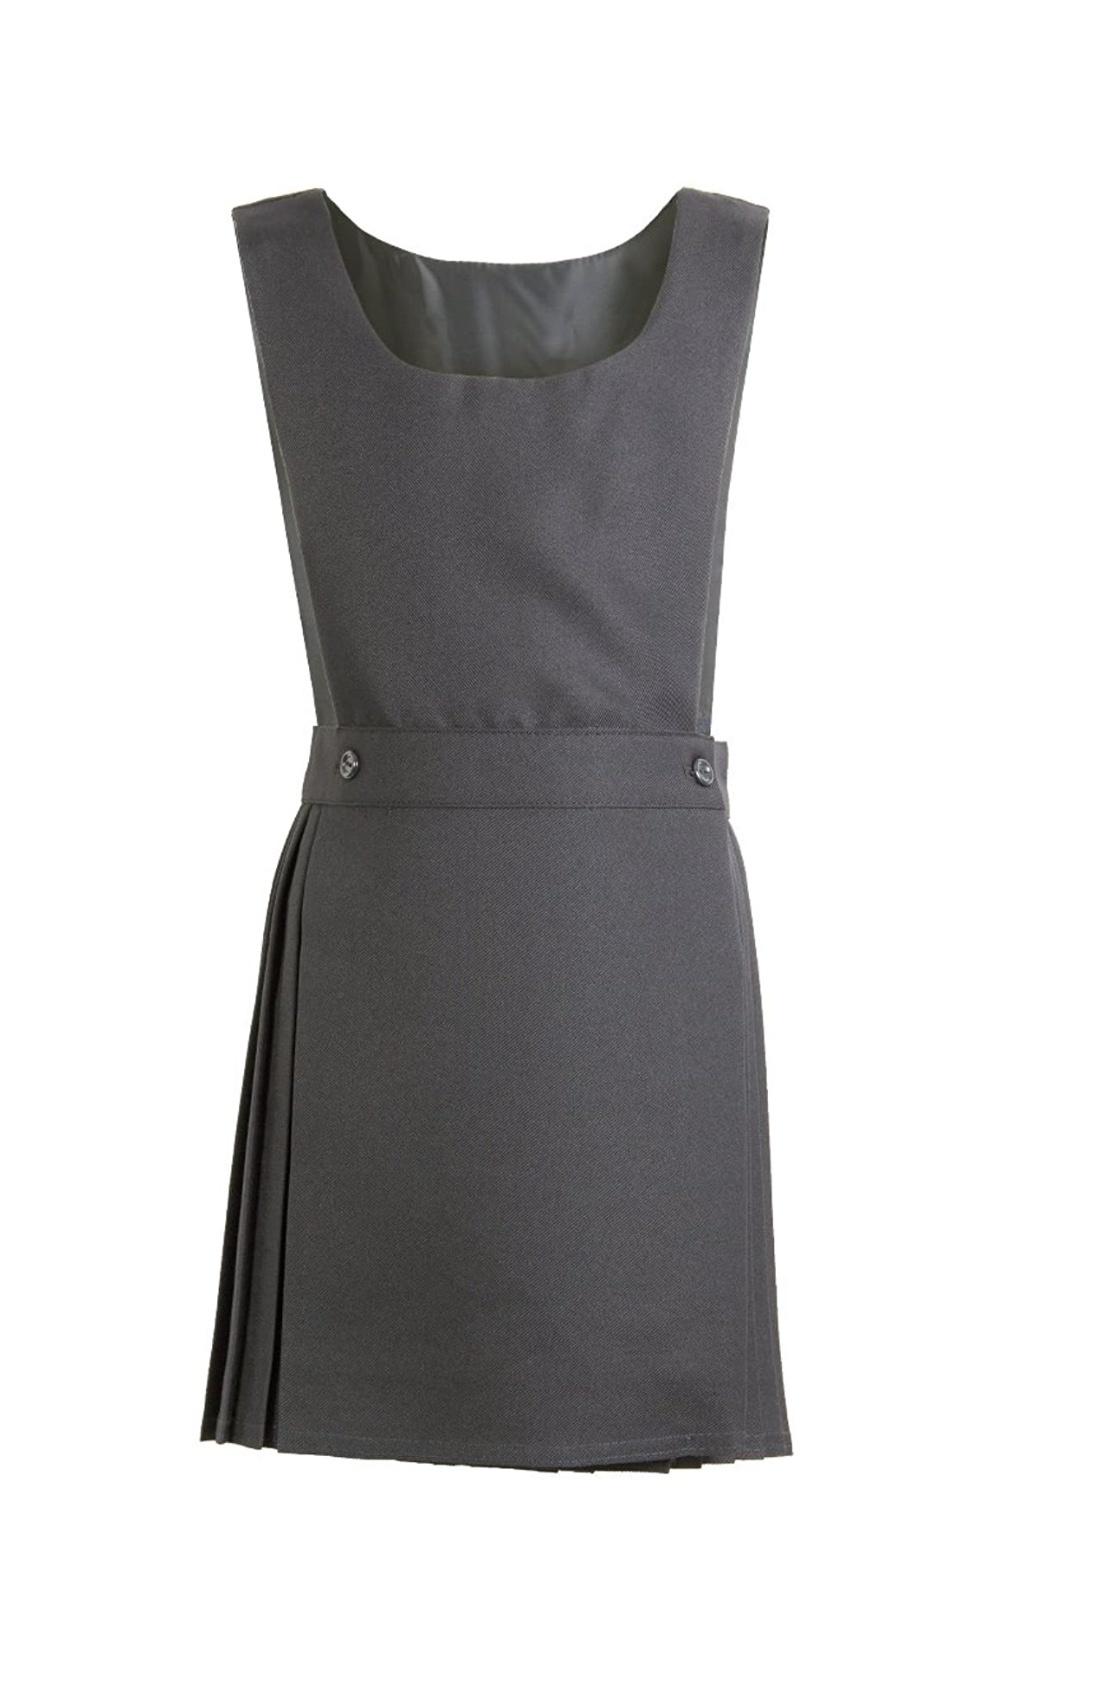 Pex Pinafore Pex Grey Kilt style Pinafore